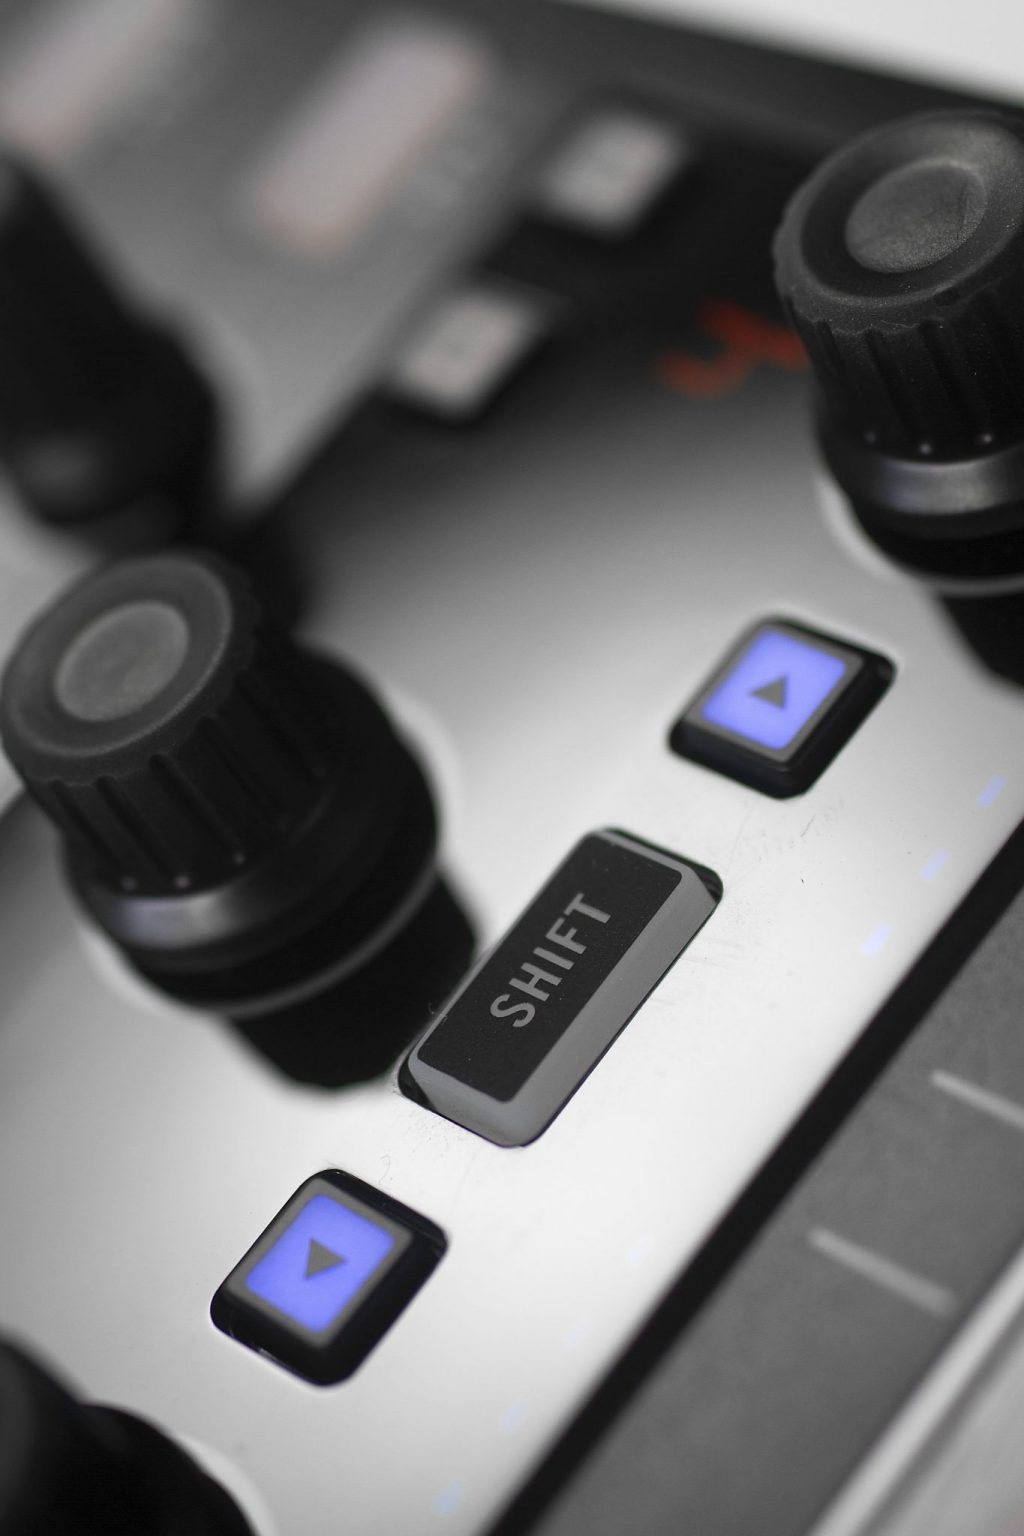 Native Instruments Traktor Kontrol X1 MK2 DJ Controller Review (11)